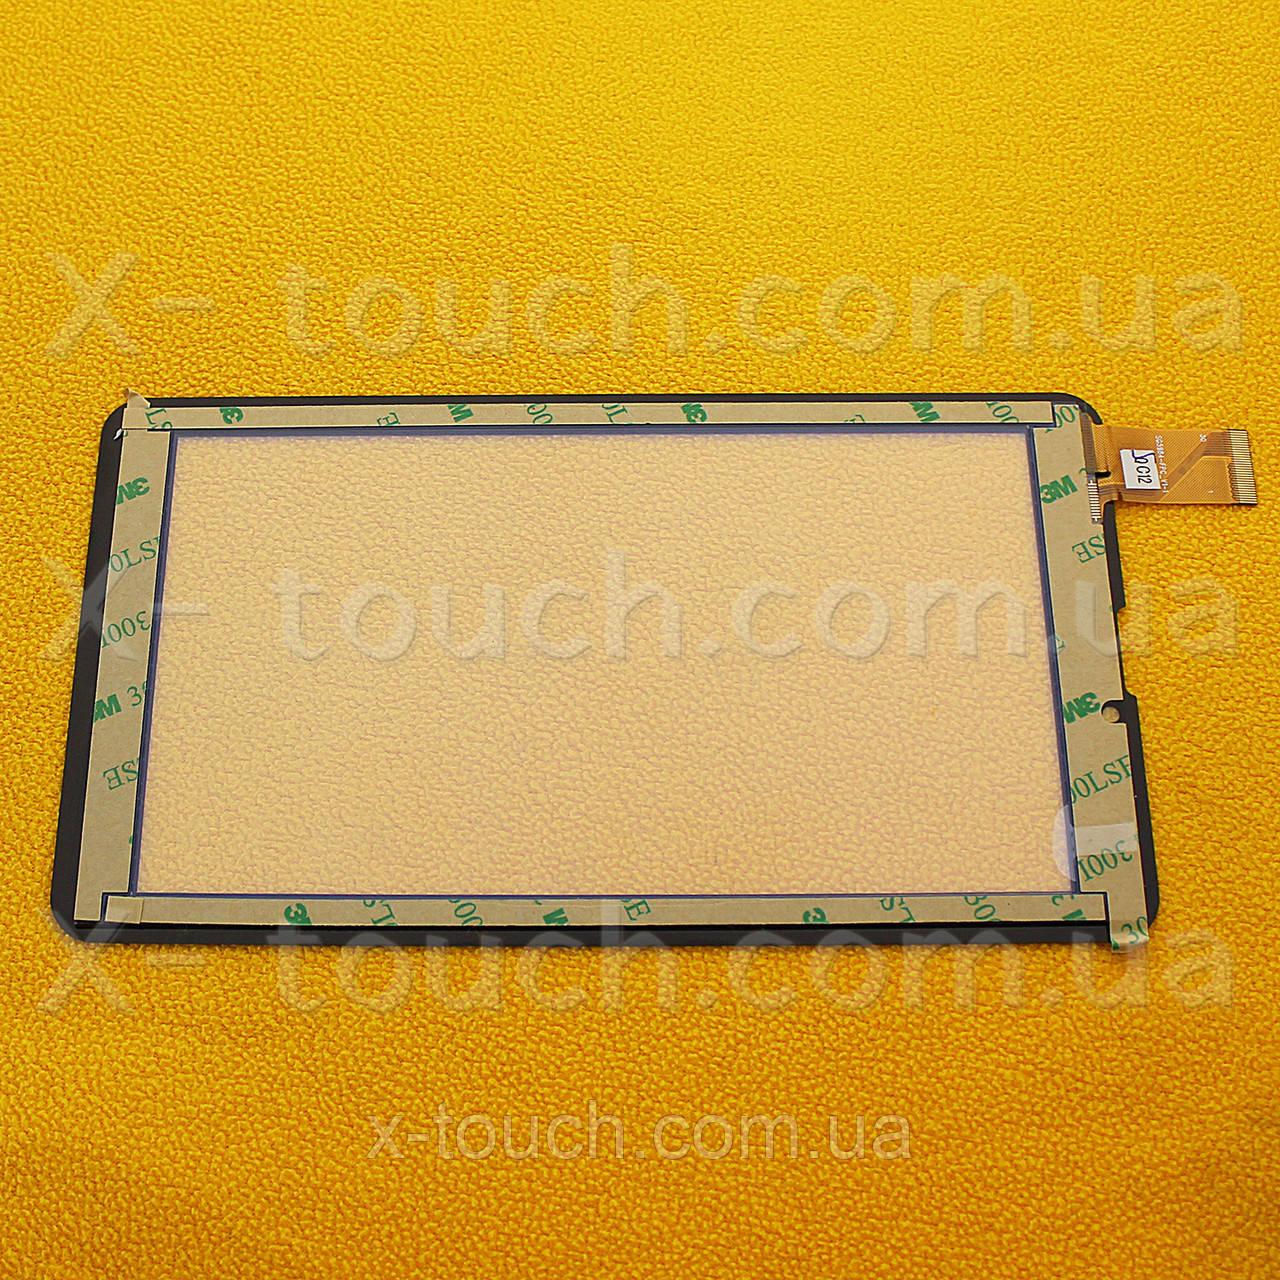 EvroMedia Play Pad M506 3G DUO cенсор, тачскрин 7,0 дюймов, белы